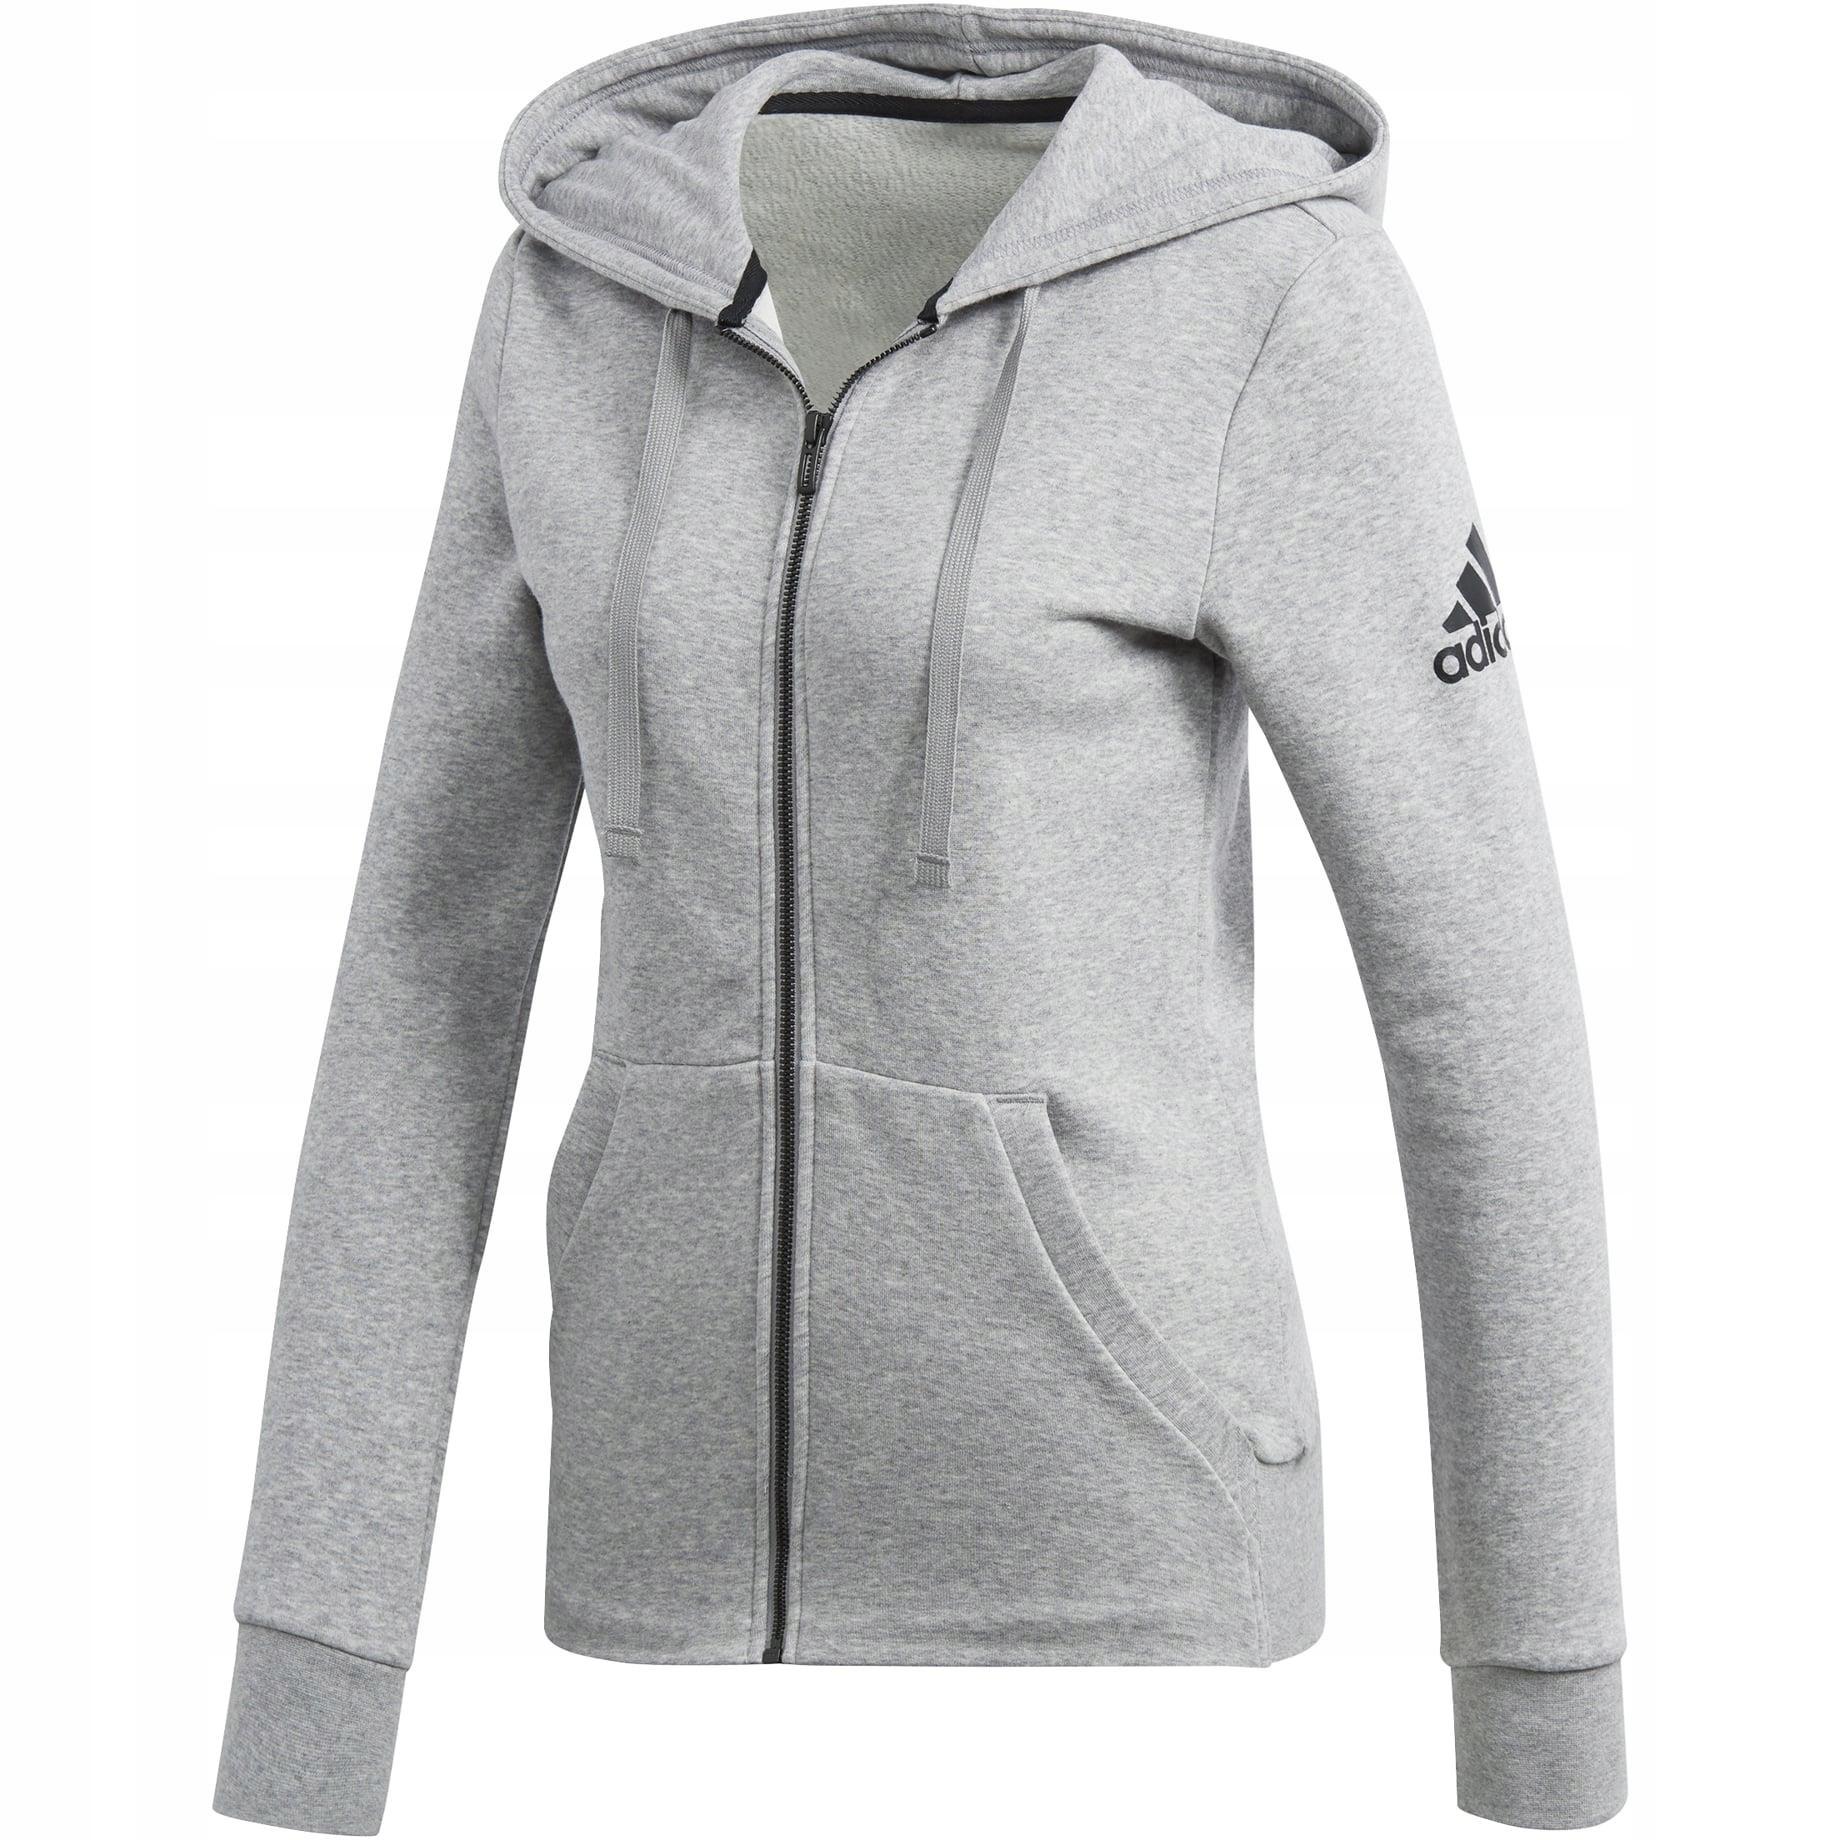 Adidas Bluza Damska z kapturem rozpinana szara S97086